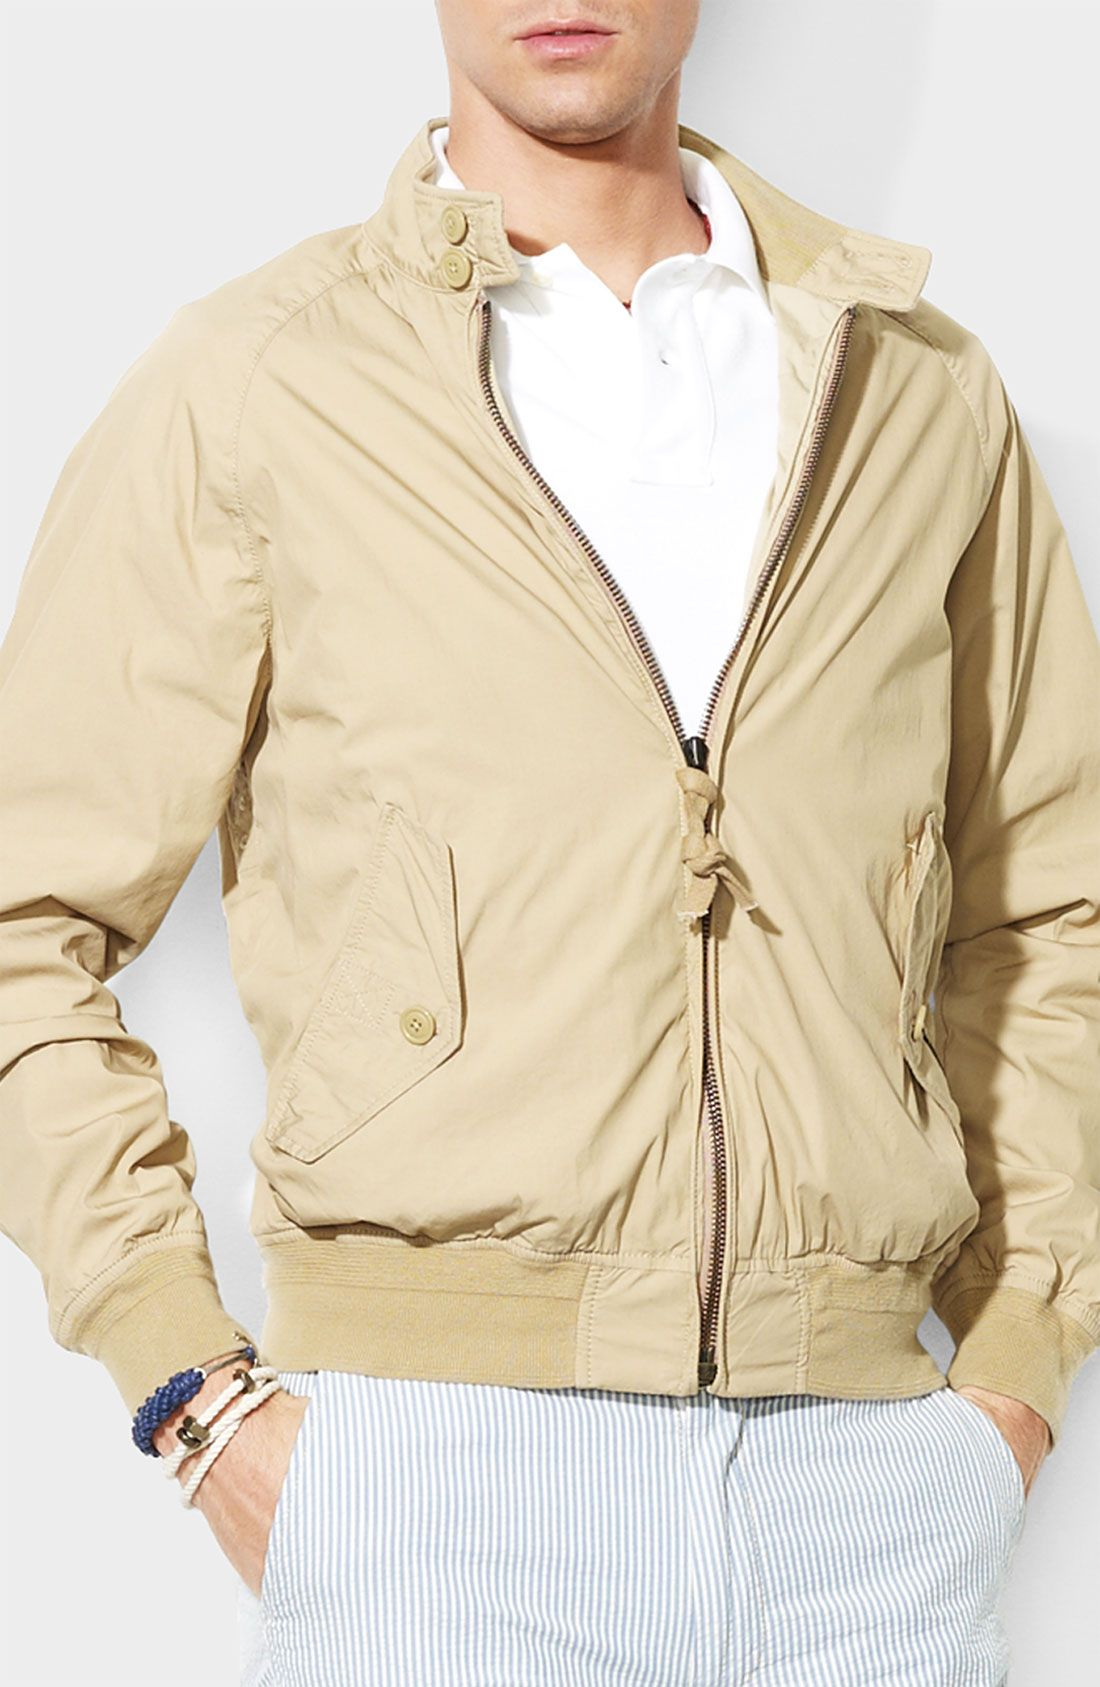 polo ralph lauren harrington jacket in beige {49 PLN